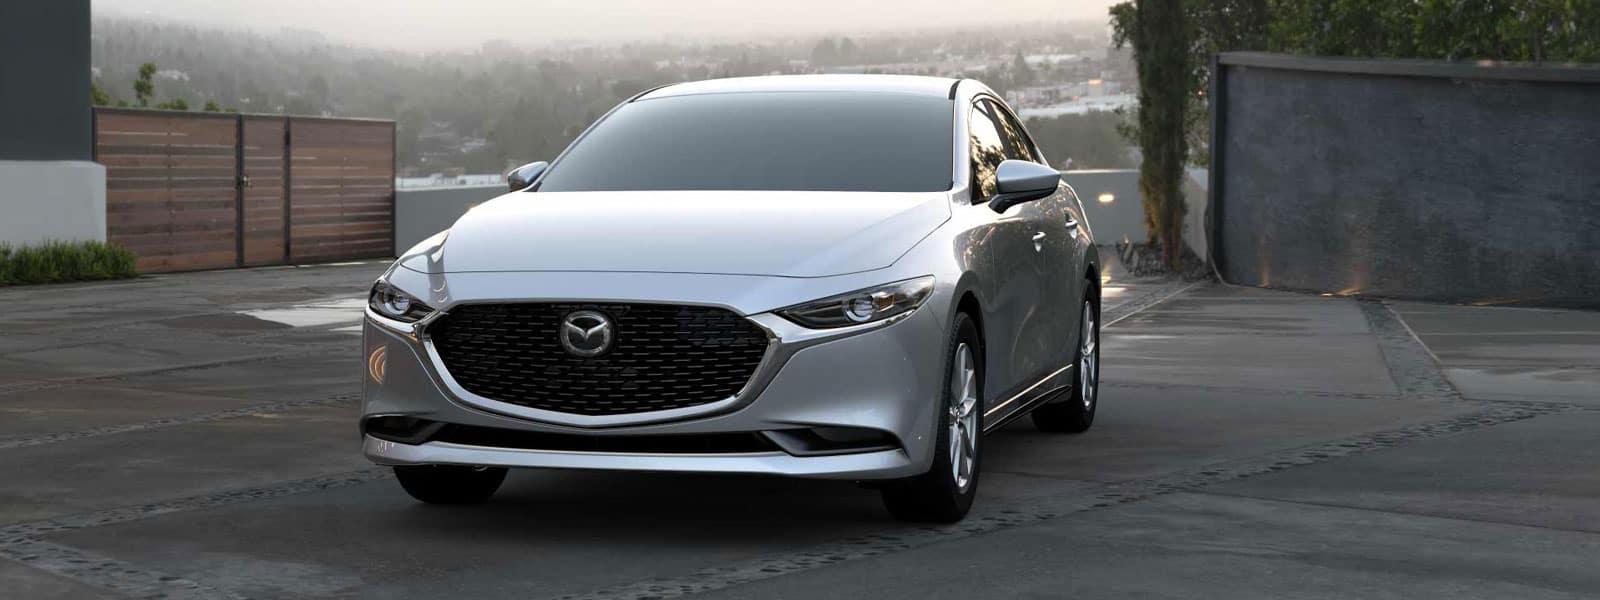 Buy or lease new Mazda3 Sedan in Tuscaloosa Alabama